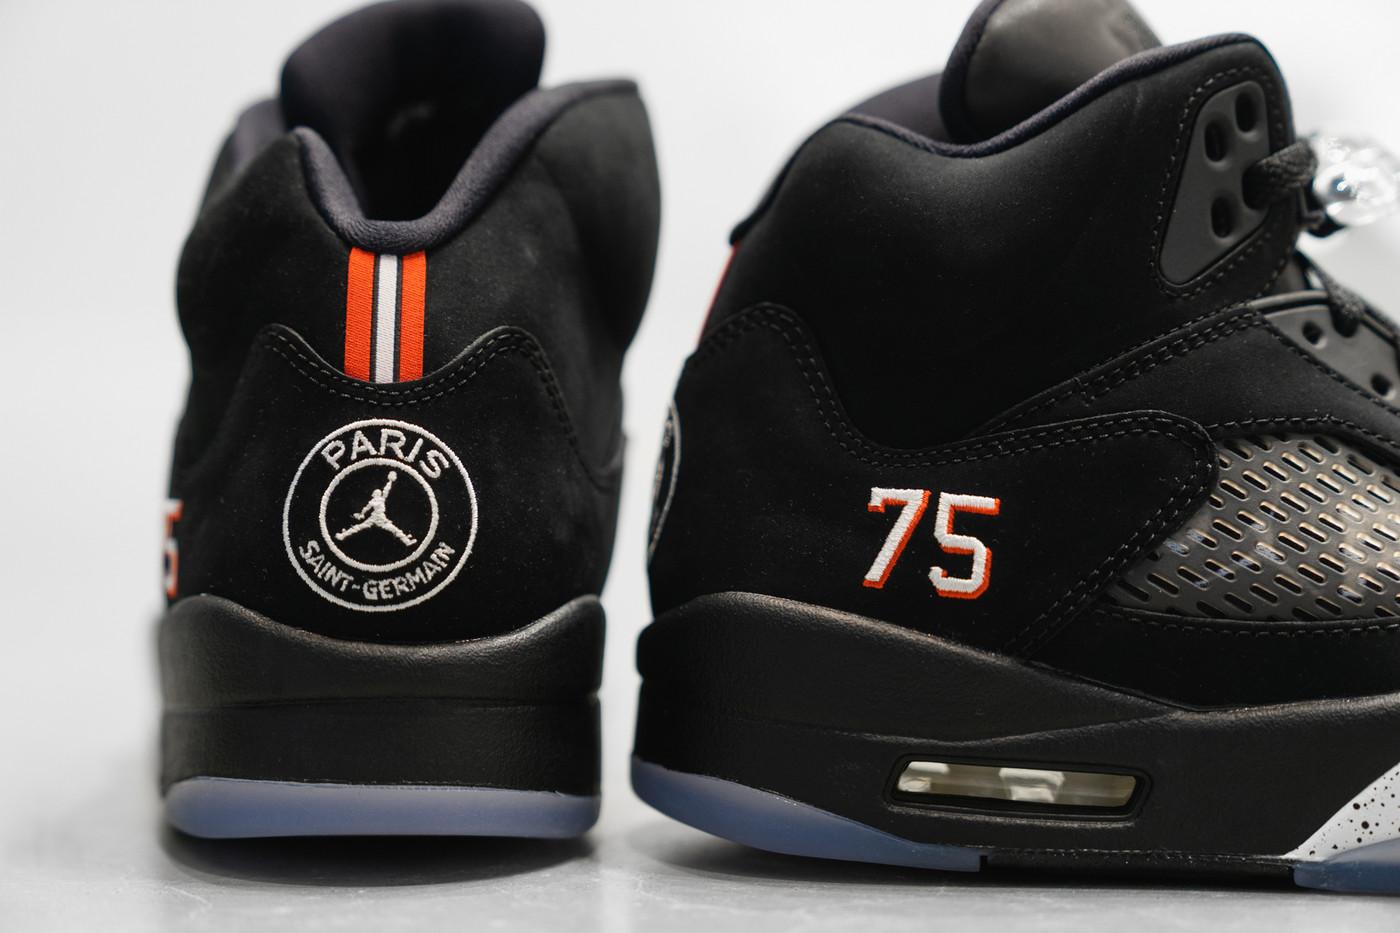 16cd4148f07f The Real Dwayne Allen.com  Jordan Brand x Paris Saint-Germain Collection